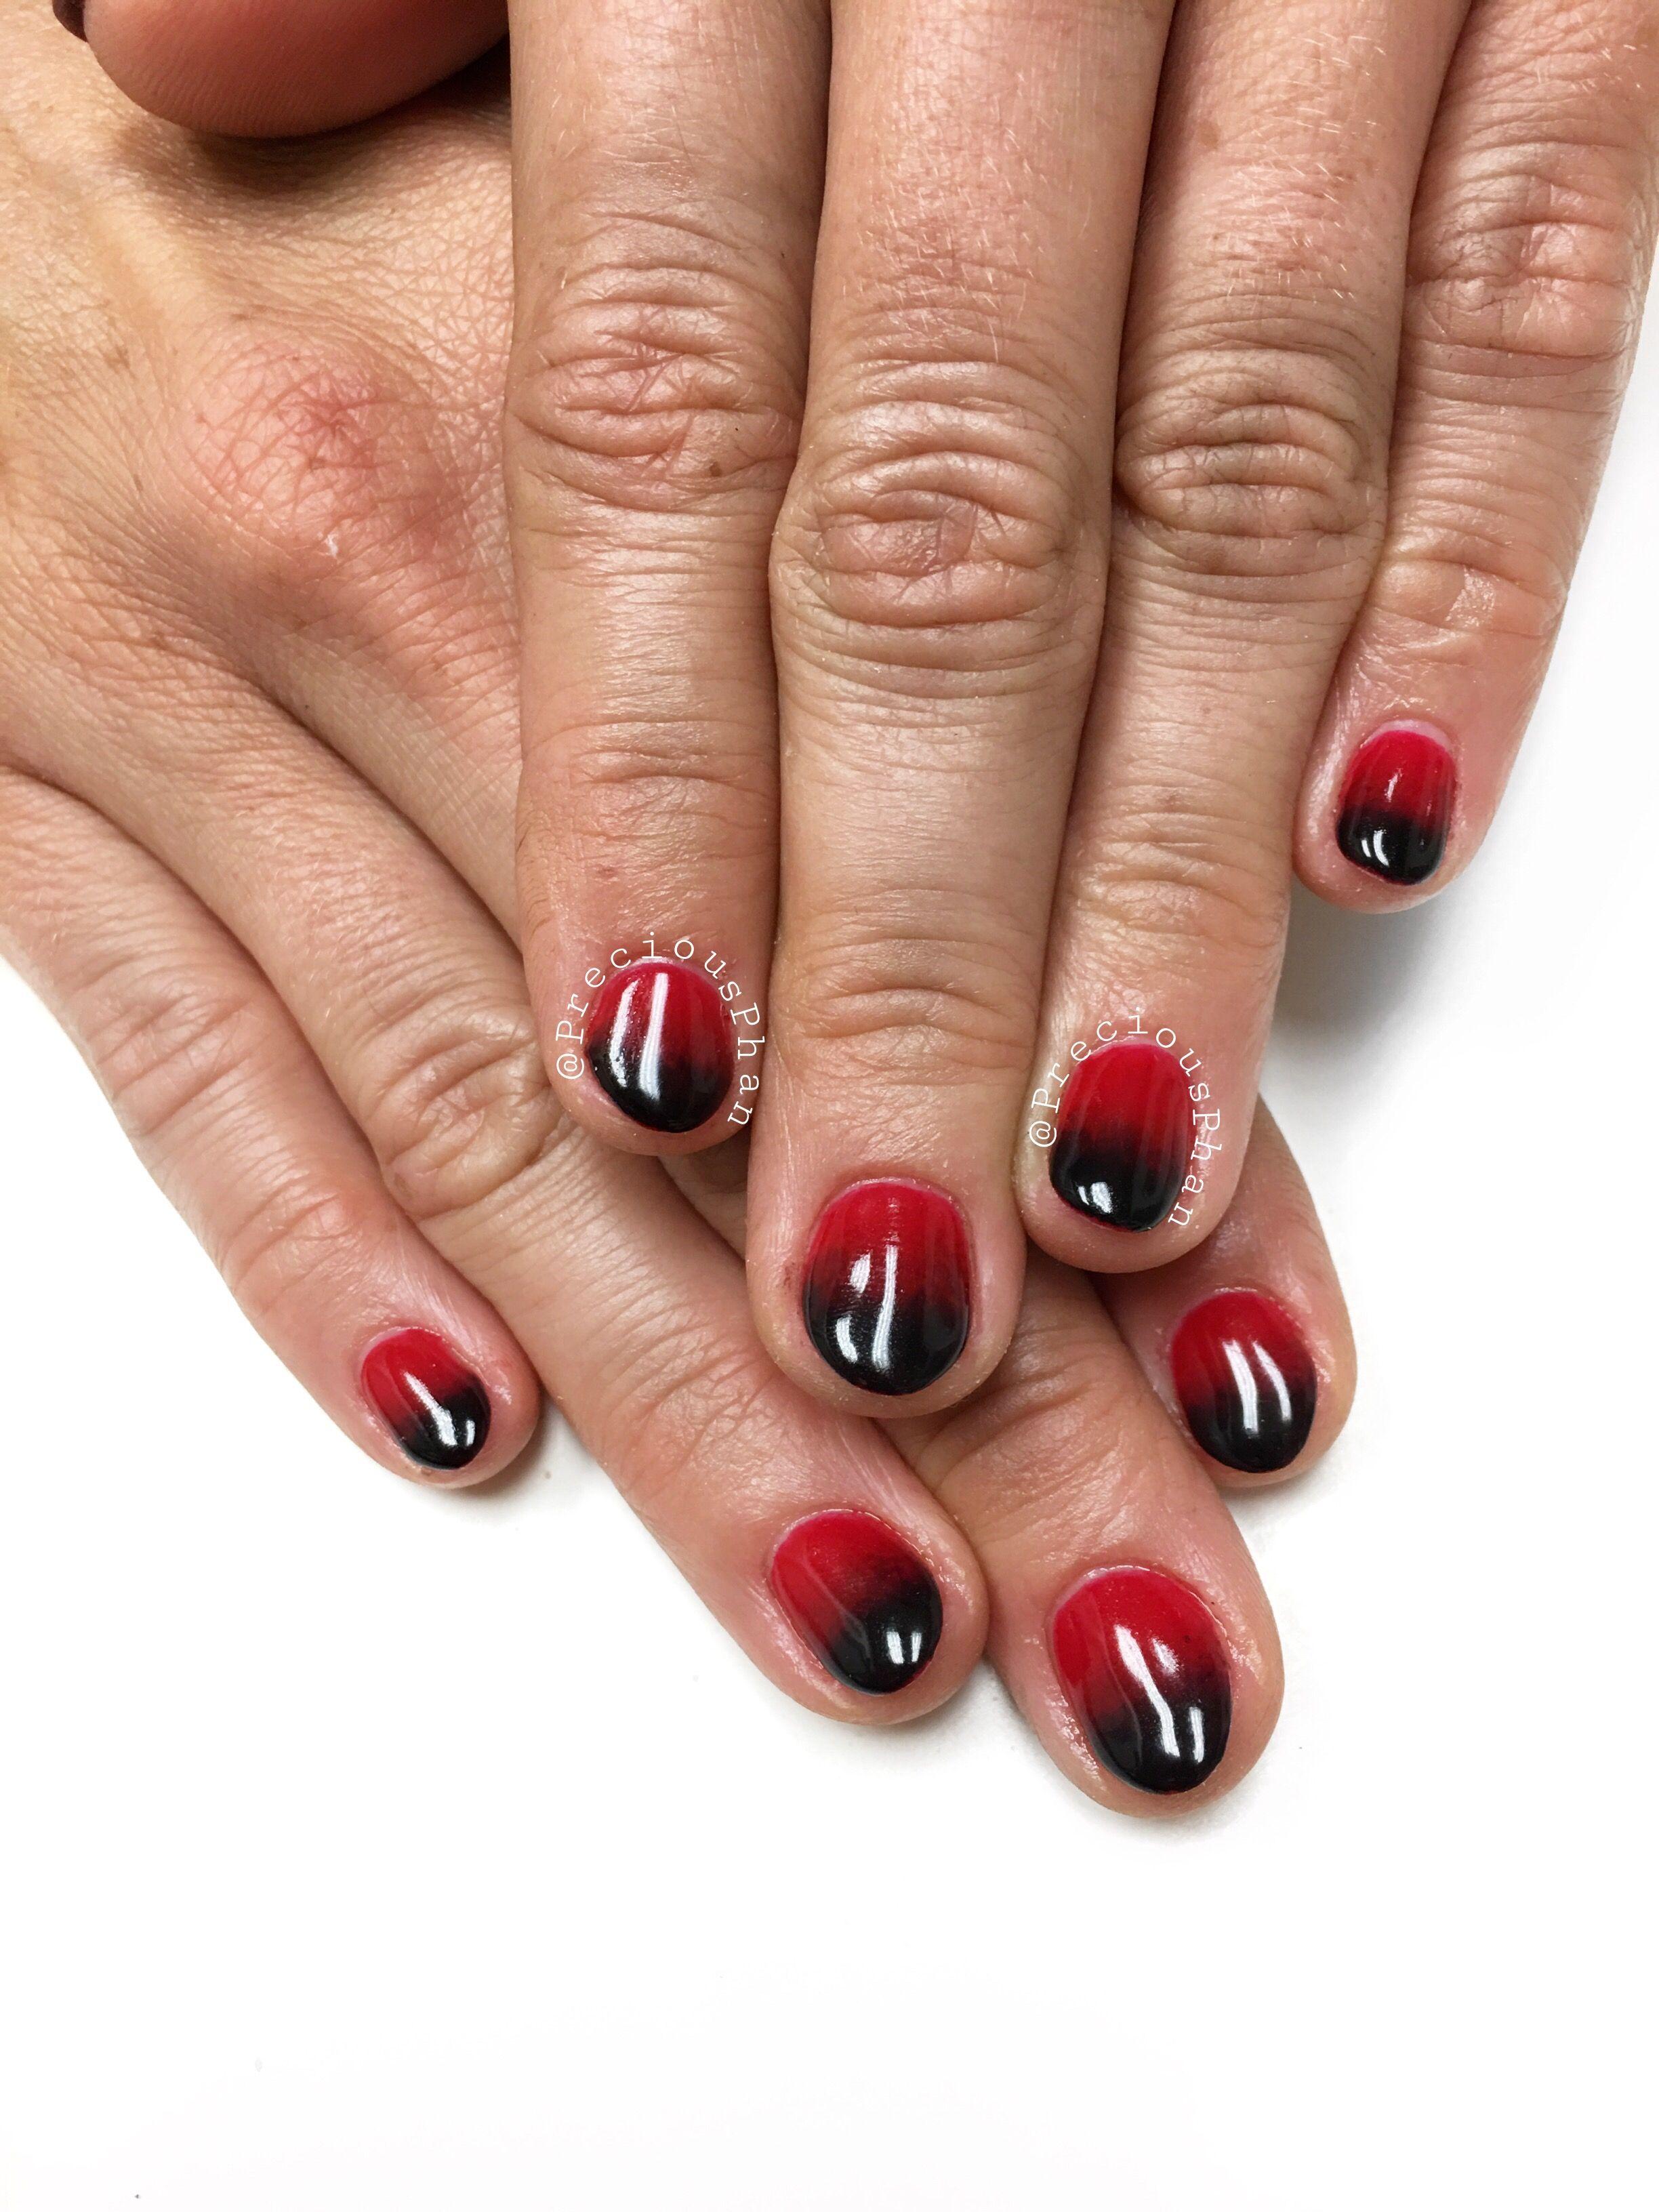 Black and red ombré nails. Oval nails. #PreciousPhan | Precious Phan ...